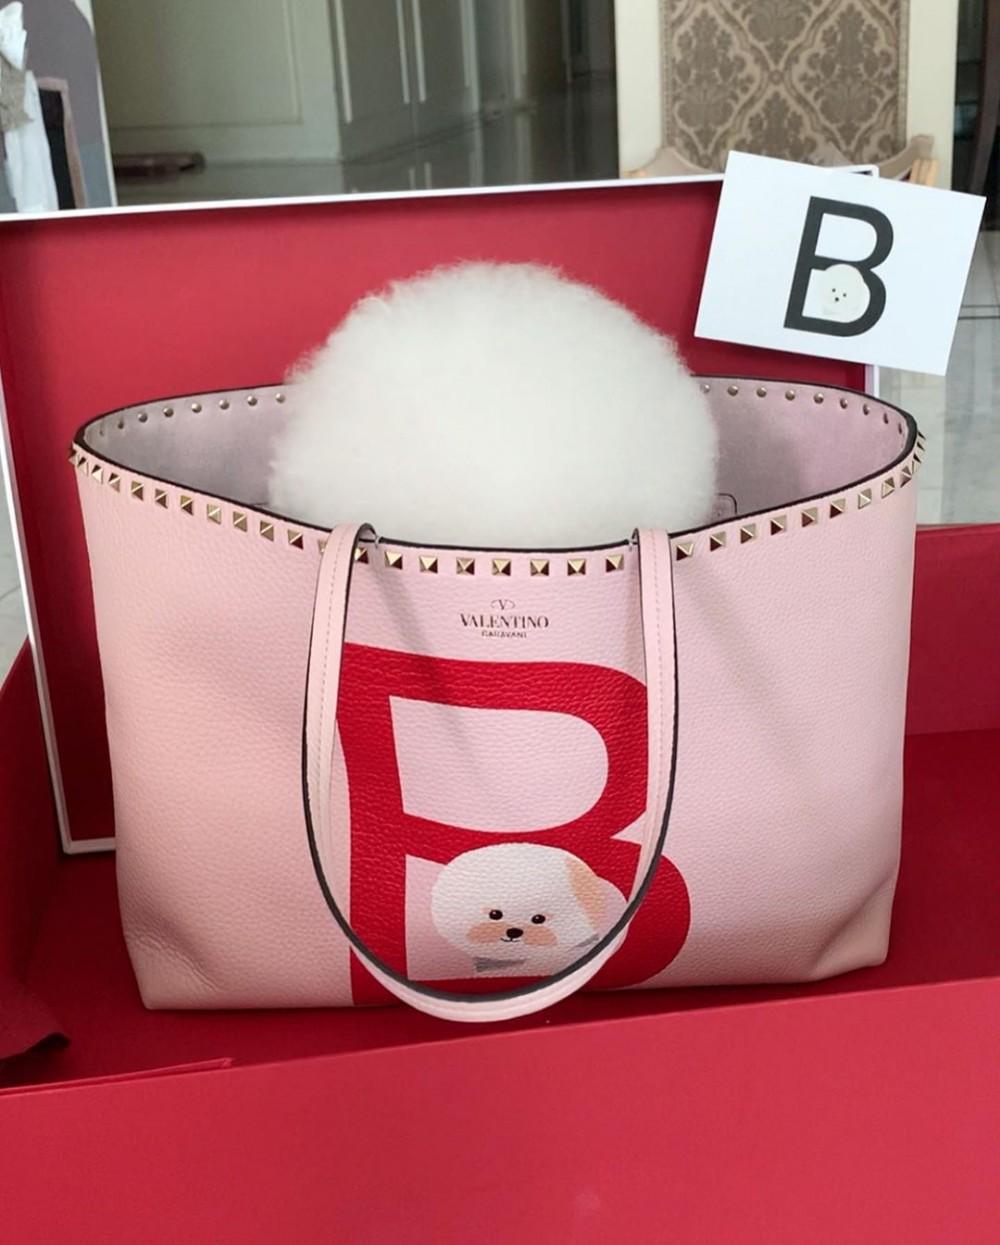 Valentino Garavani Rockstud Pet線上企劃 獨家訂製專屬愛犬袋002